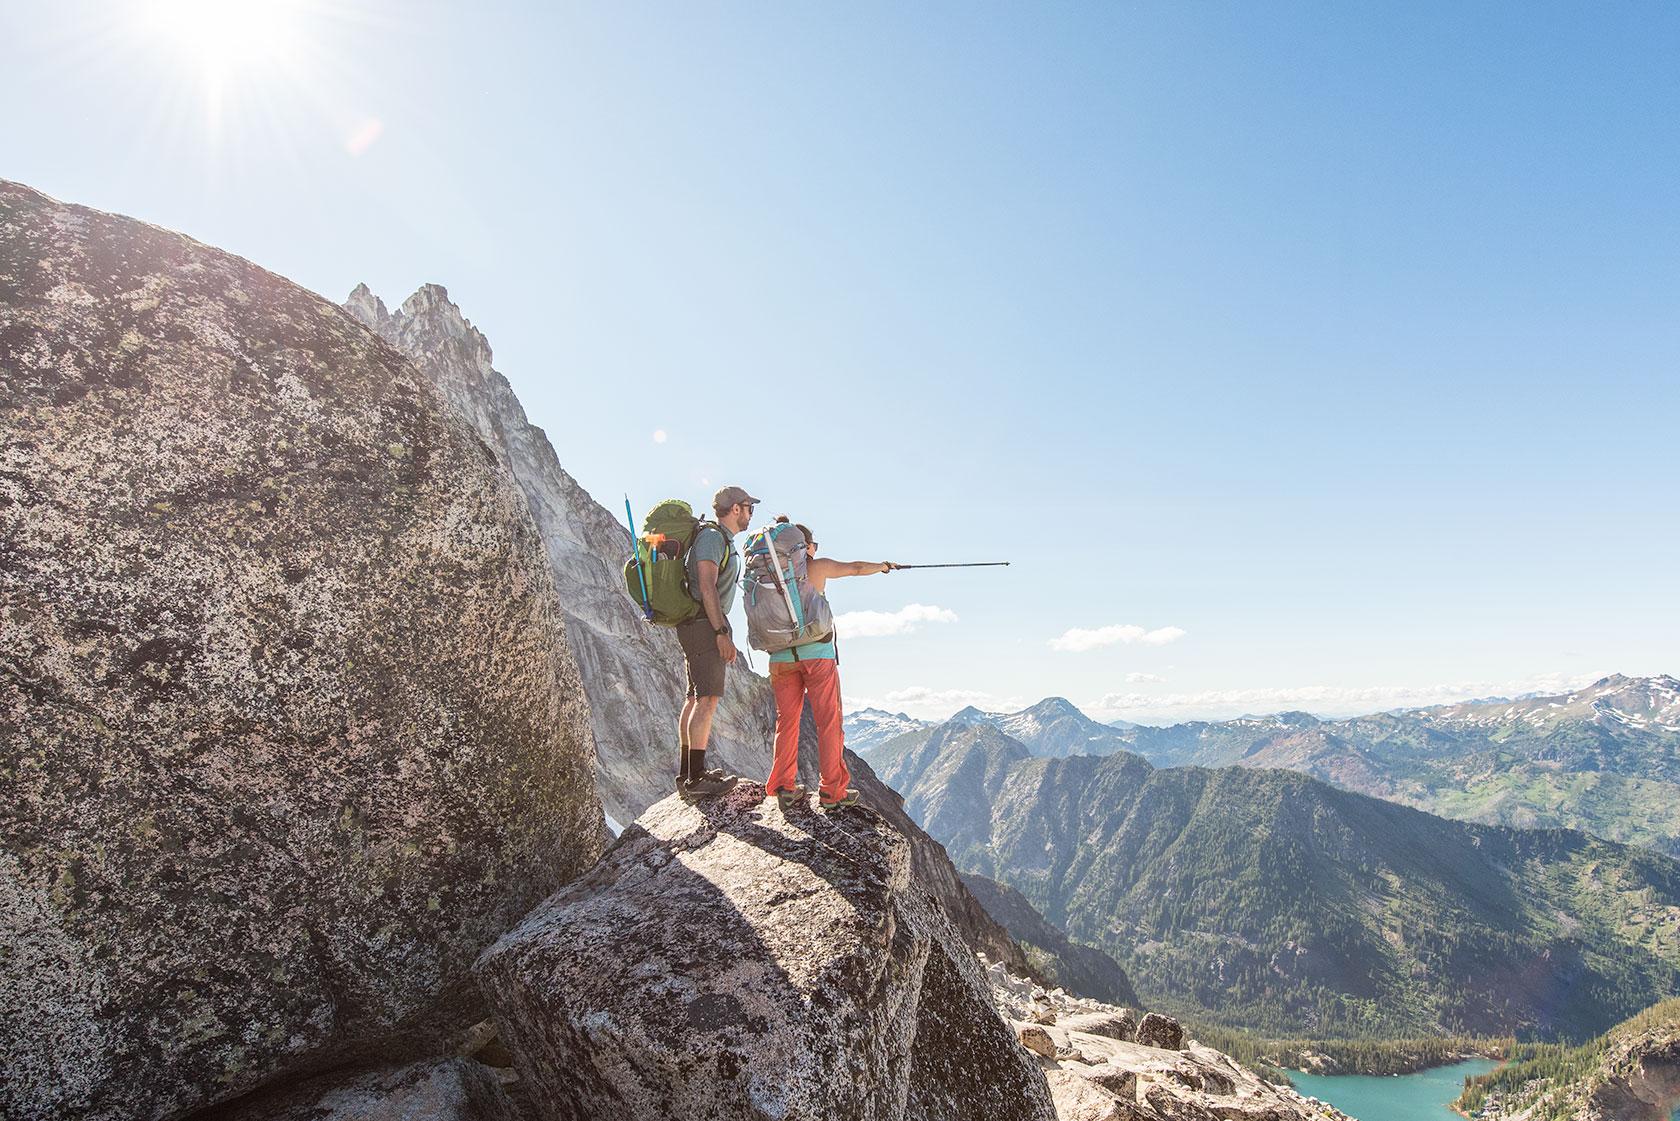 austin-trigg-osprey-hiking-backpacks-washington-lifestyle-morning-adventure-outdoor-active-hike-camp-sunrise-enchantments-point-adventure.jpg